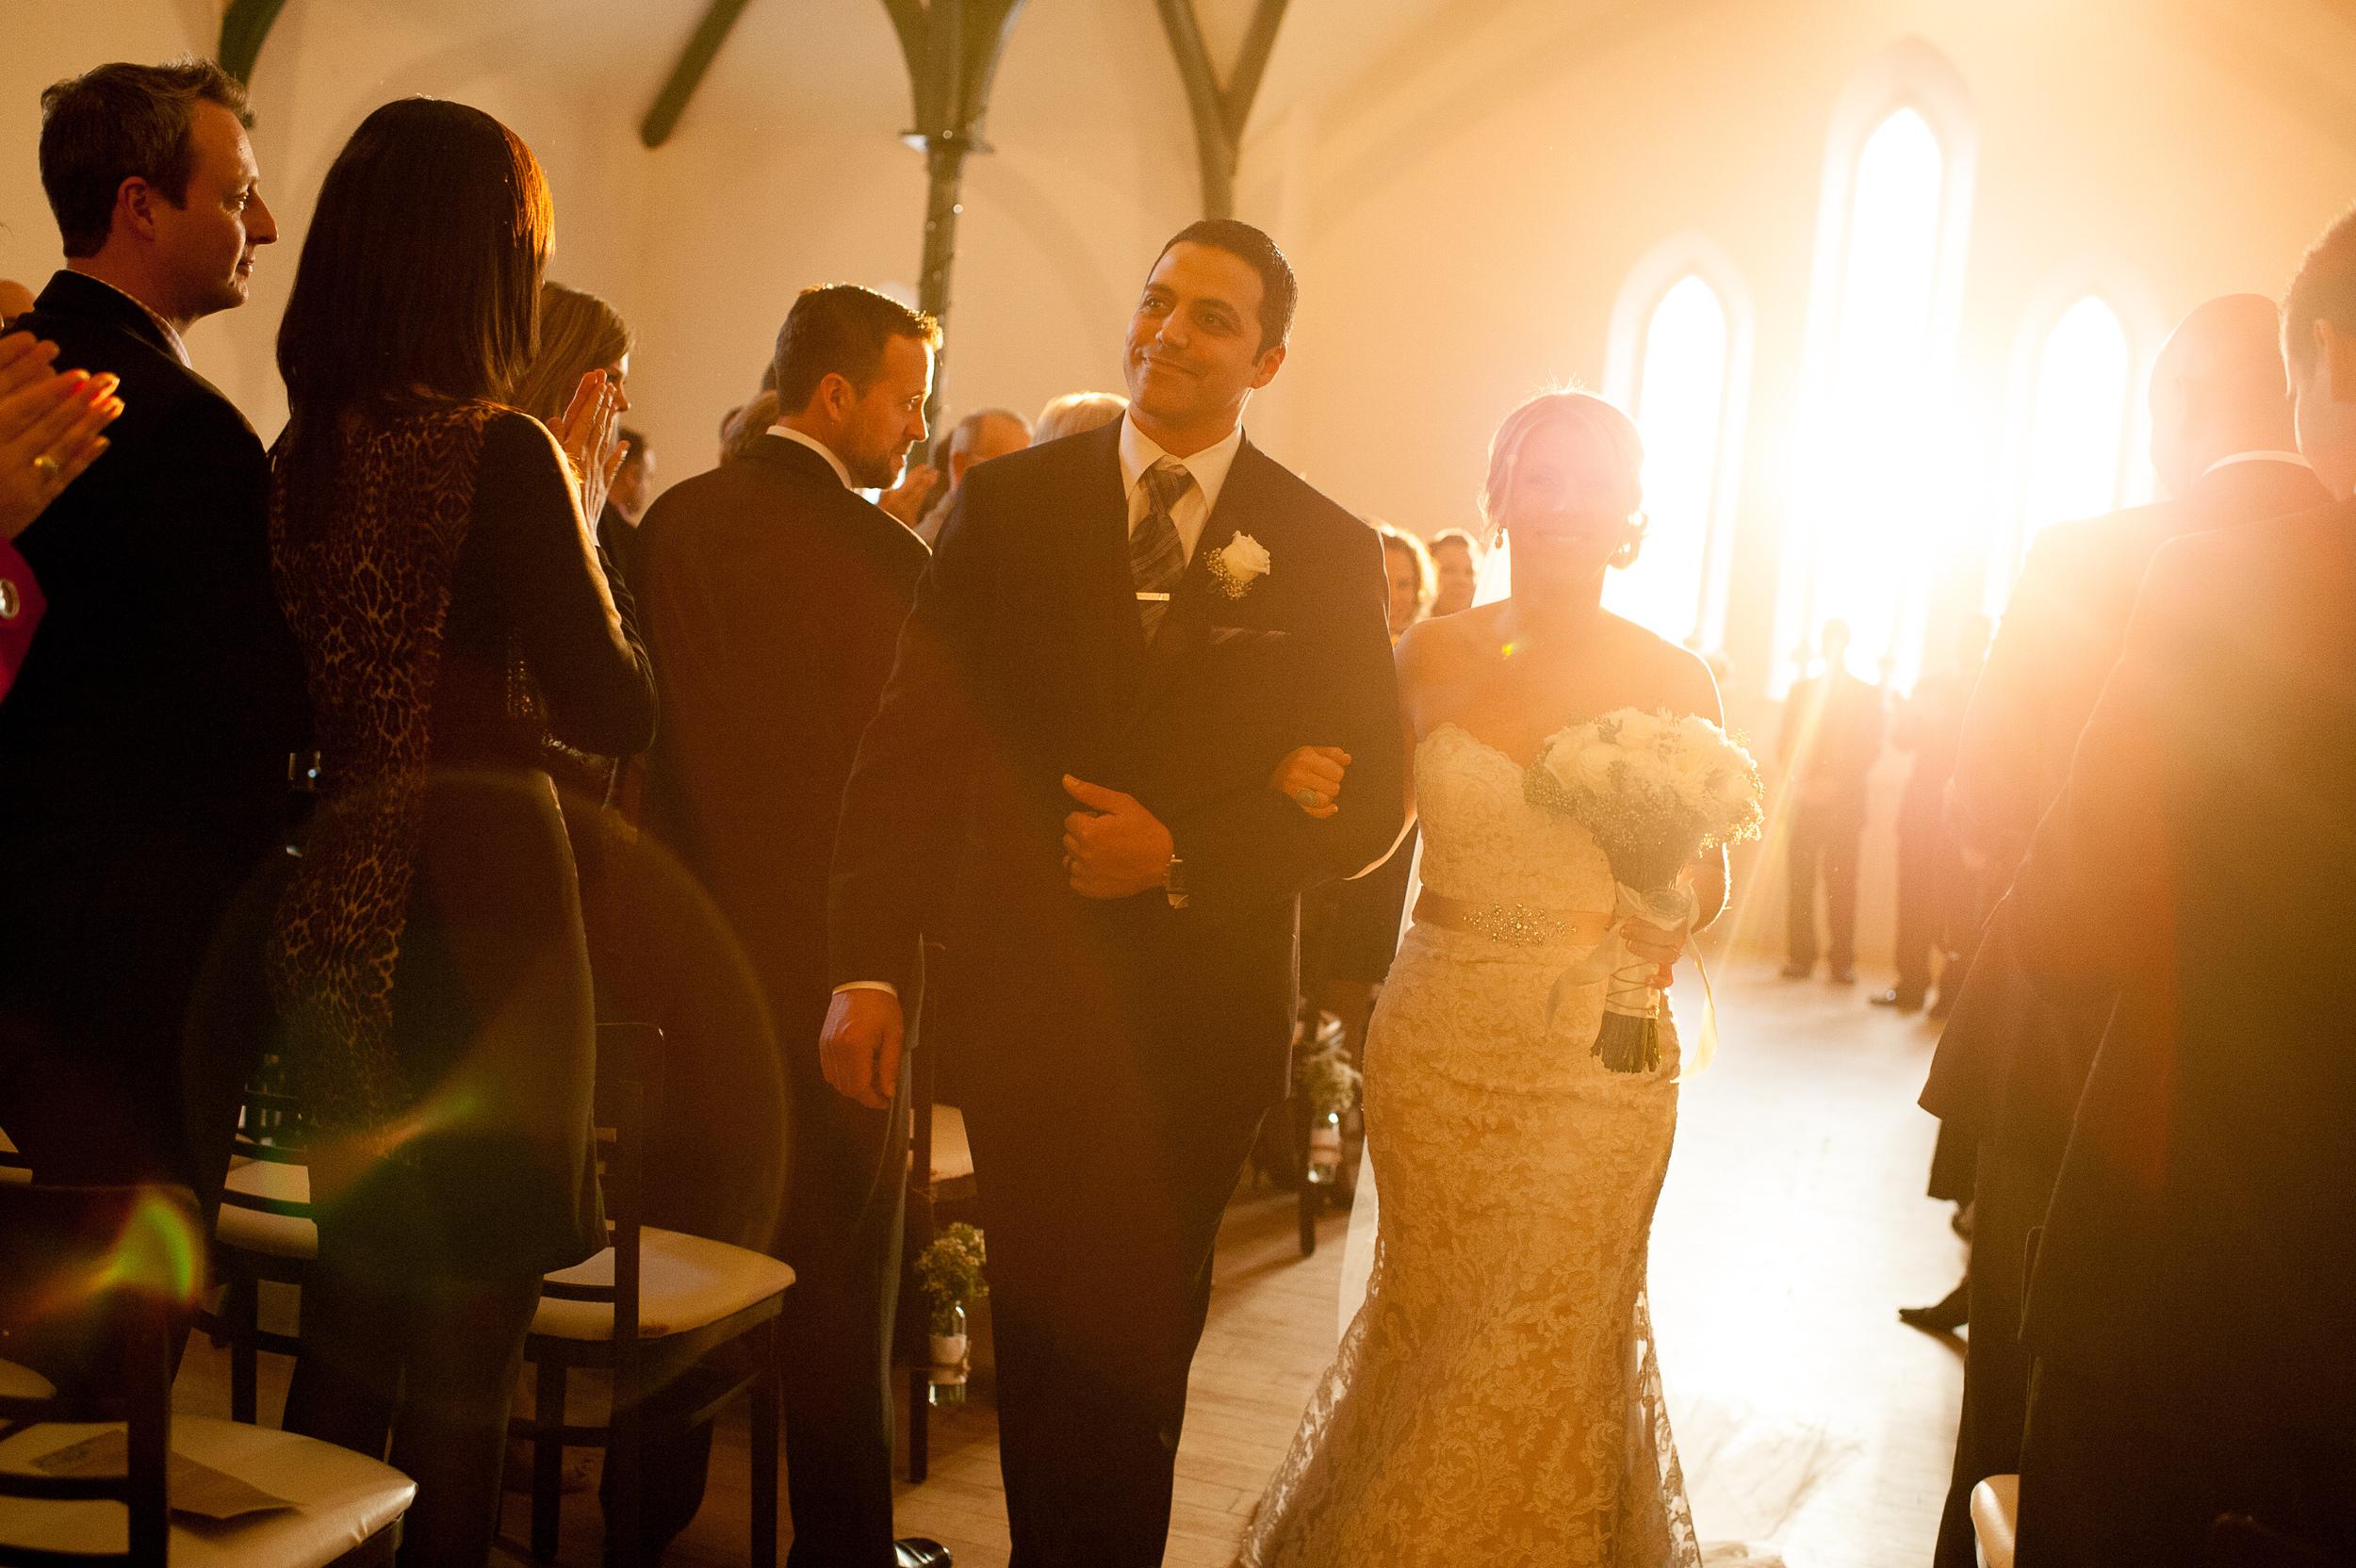 enoch-turner-wedding-photograph-006.jpg